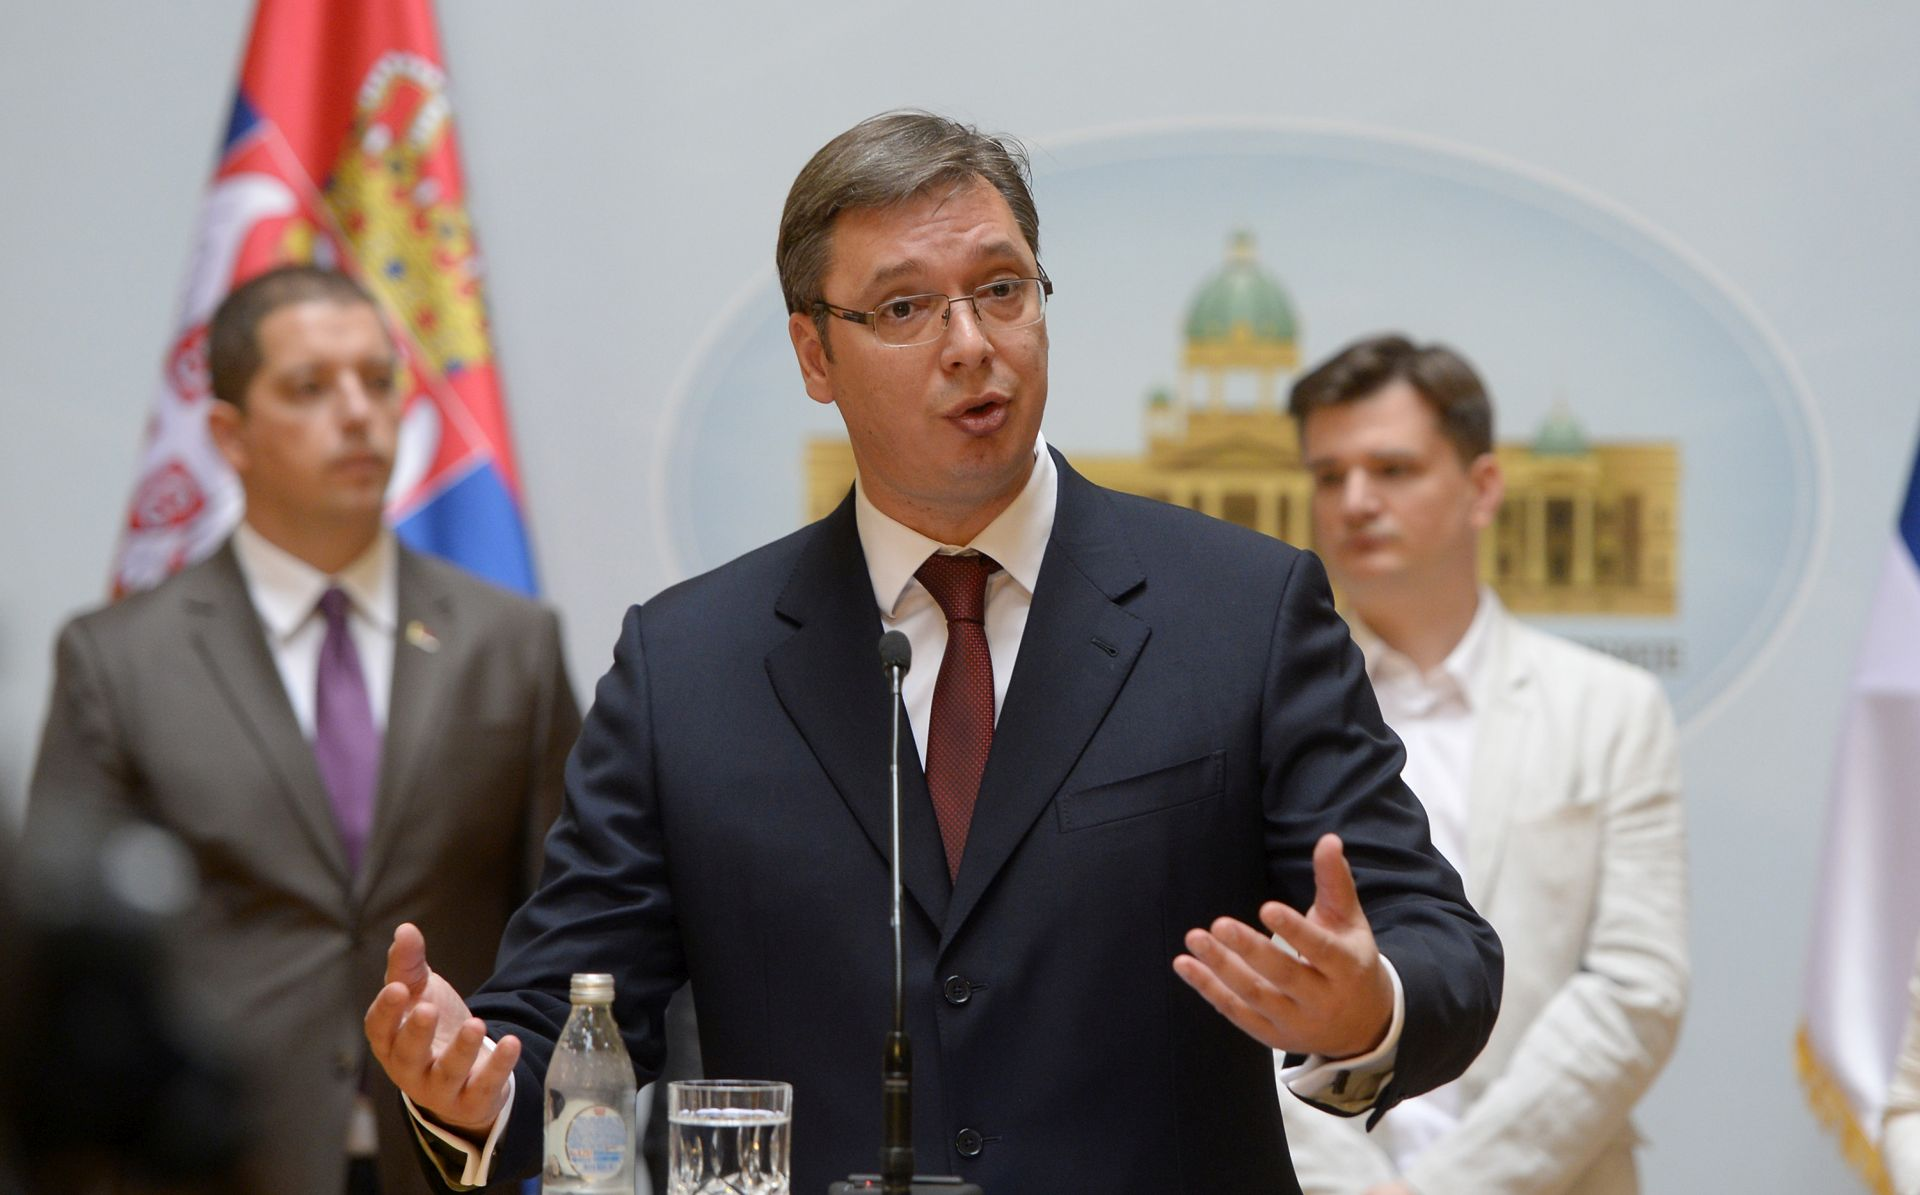 SRBIJA DOBILA NOVU VLADU: Premijer Vučić obećao prosperitet i bolji standard građana